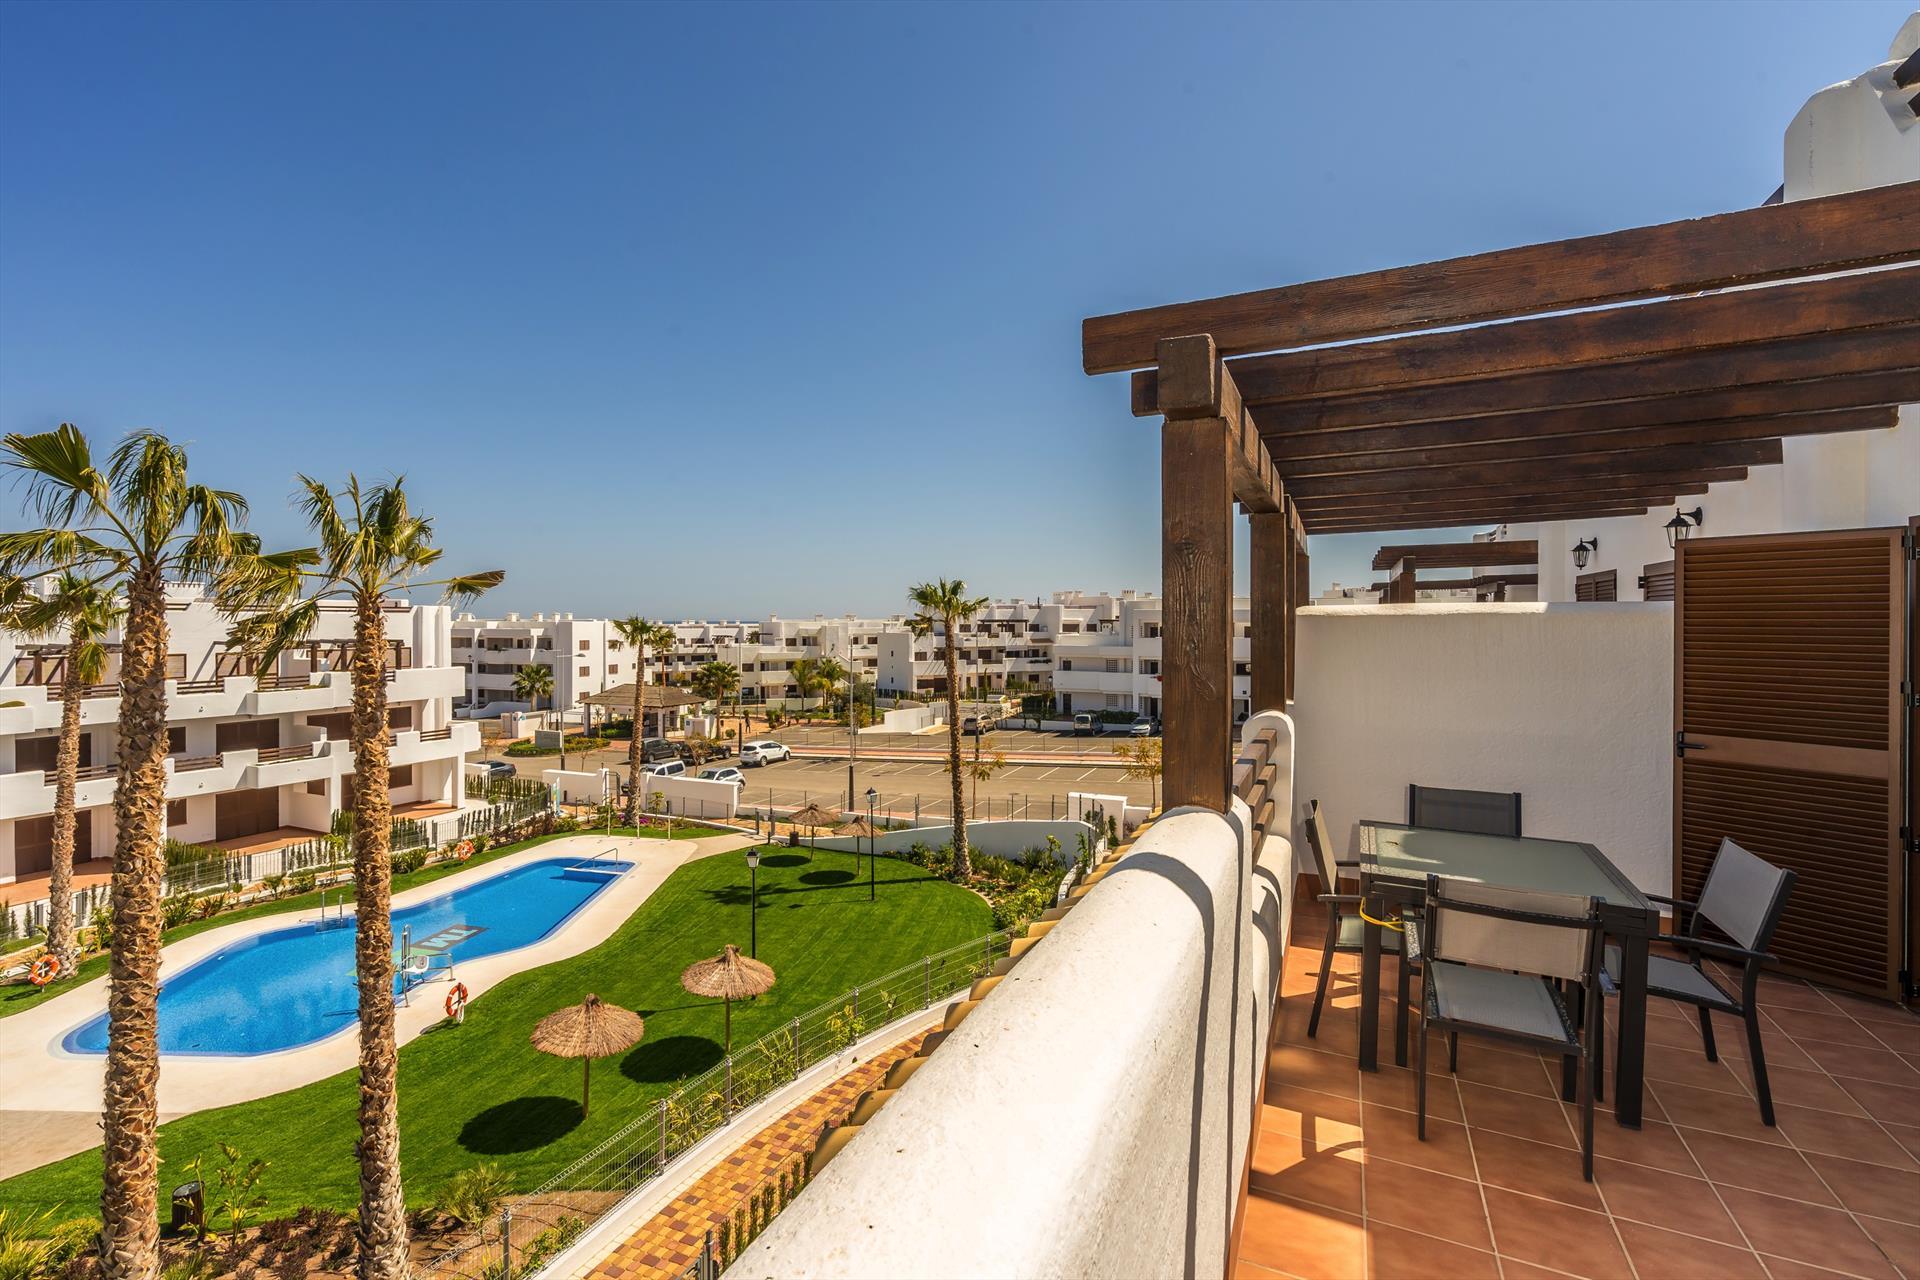 Pimienta,Beautiful apartment  with communal pool in San Juan de los Terreros, Andalusia, Spain for 4 persons.....